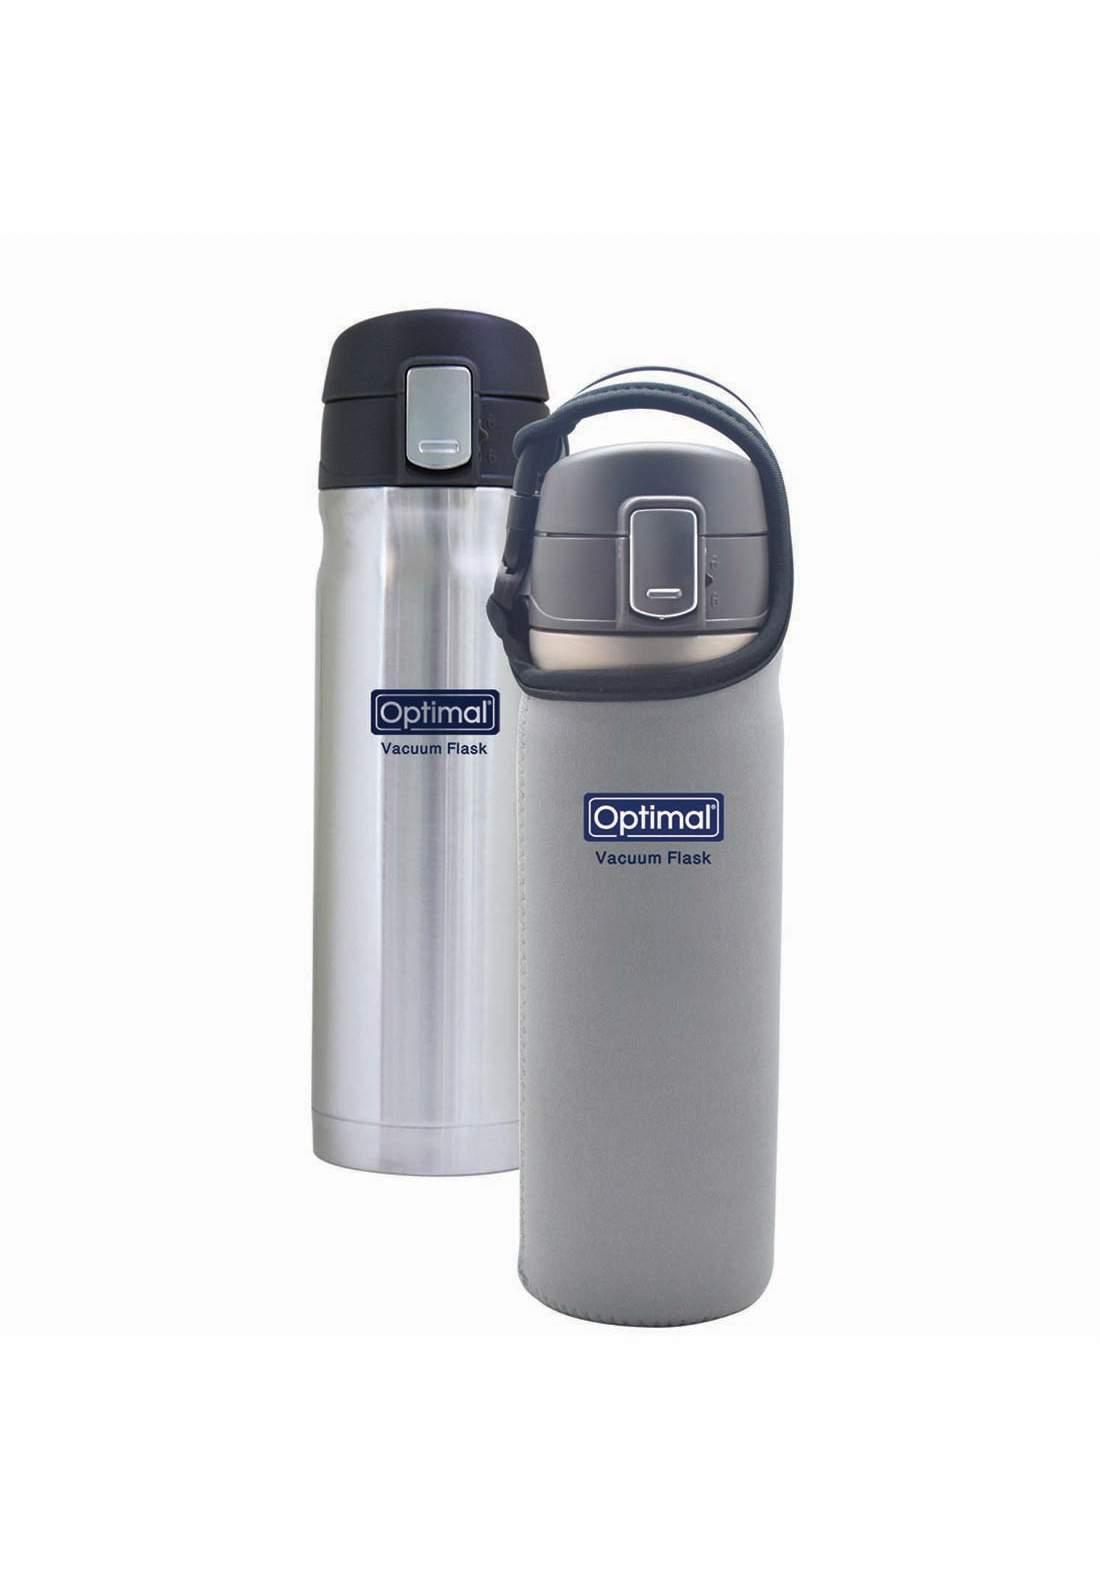 Optimal  Stainless Steel Vacum Flask 480ml  gray ترمس حافظ للحرارة